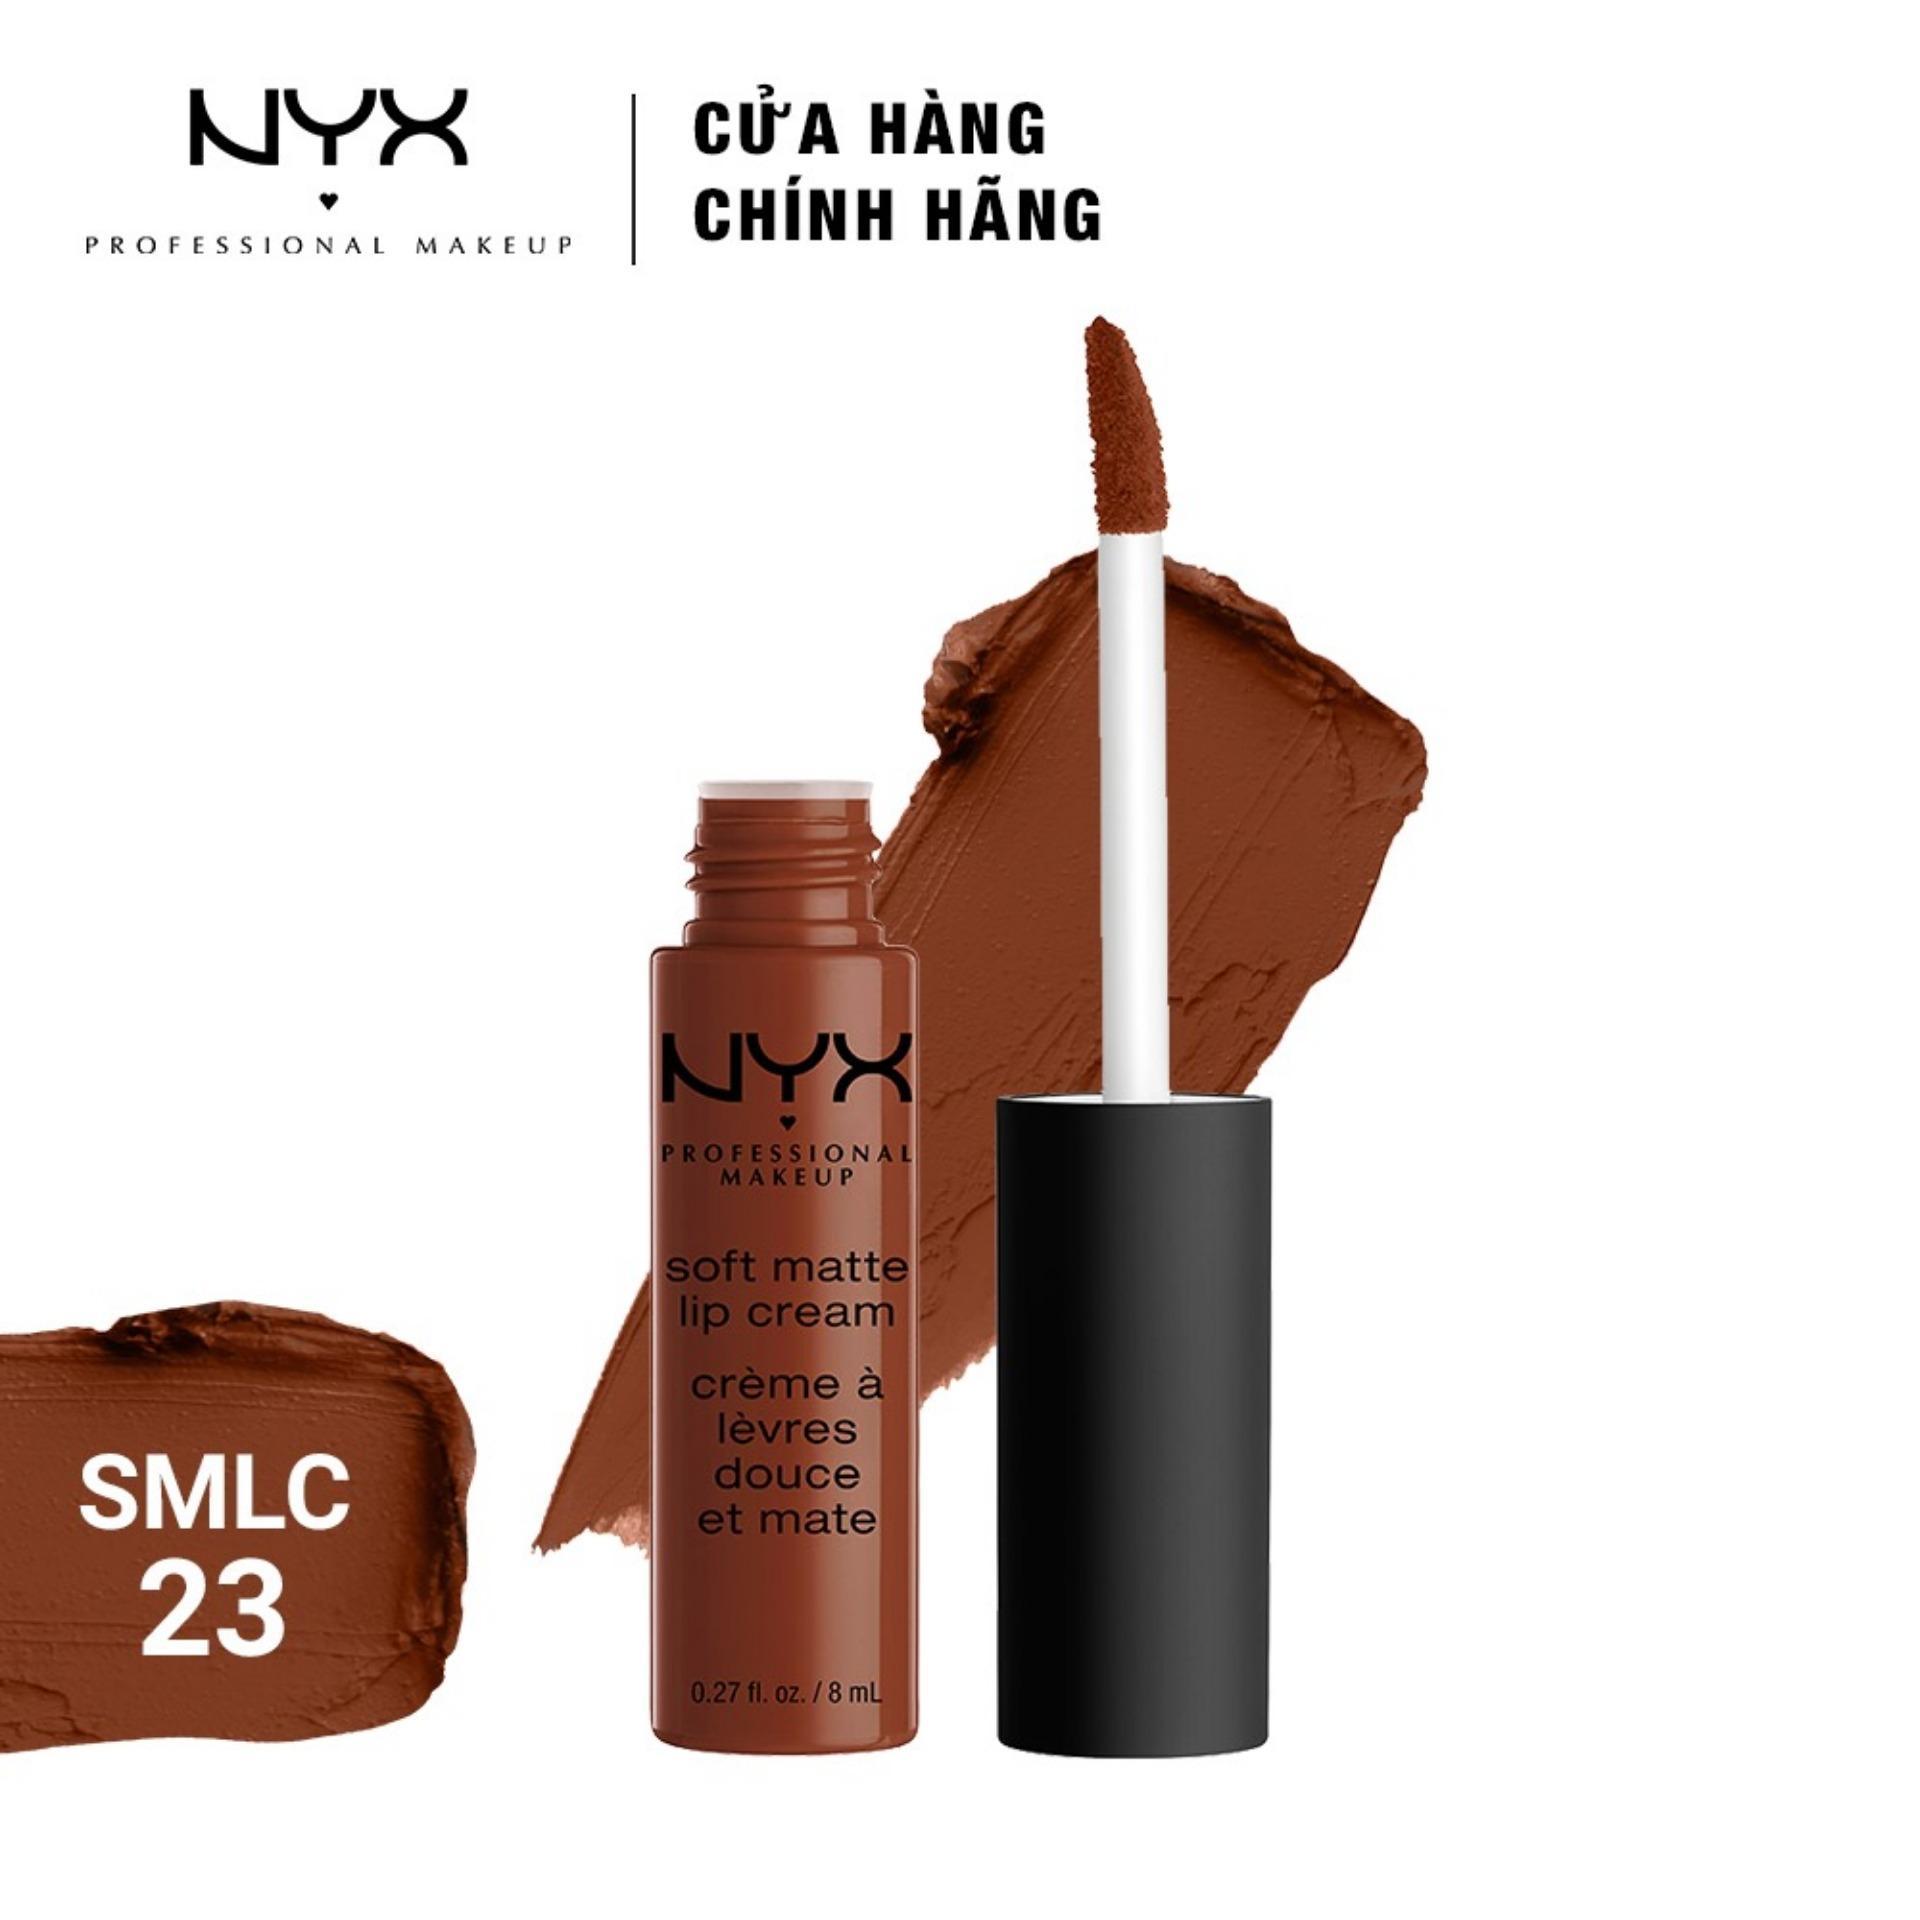 Son kem lì NYX Professional Makeup Soft Matte Lip Cream 8ml tốt nhất